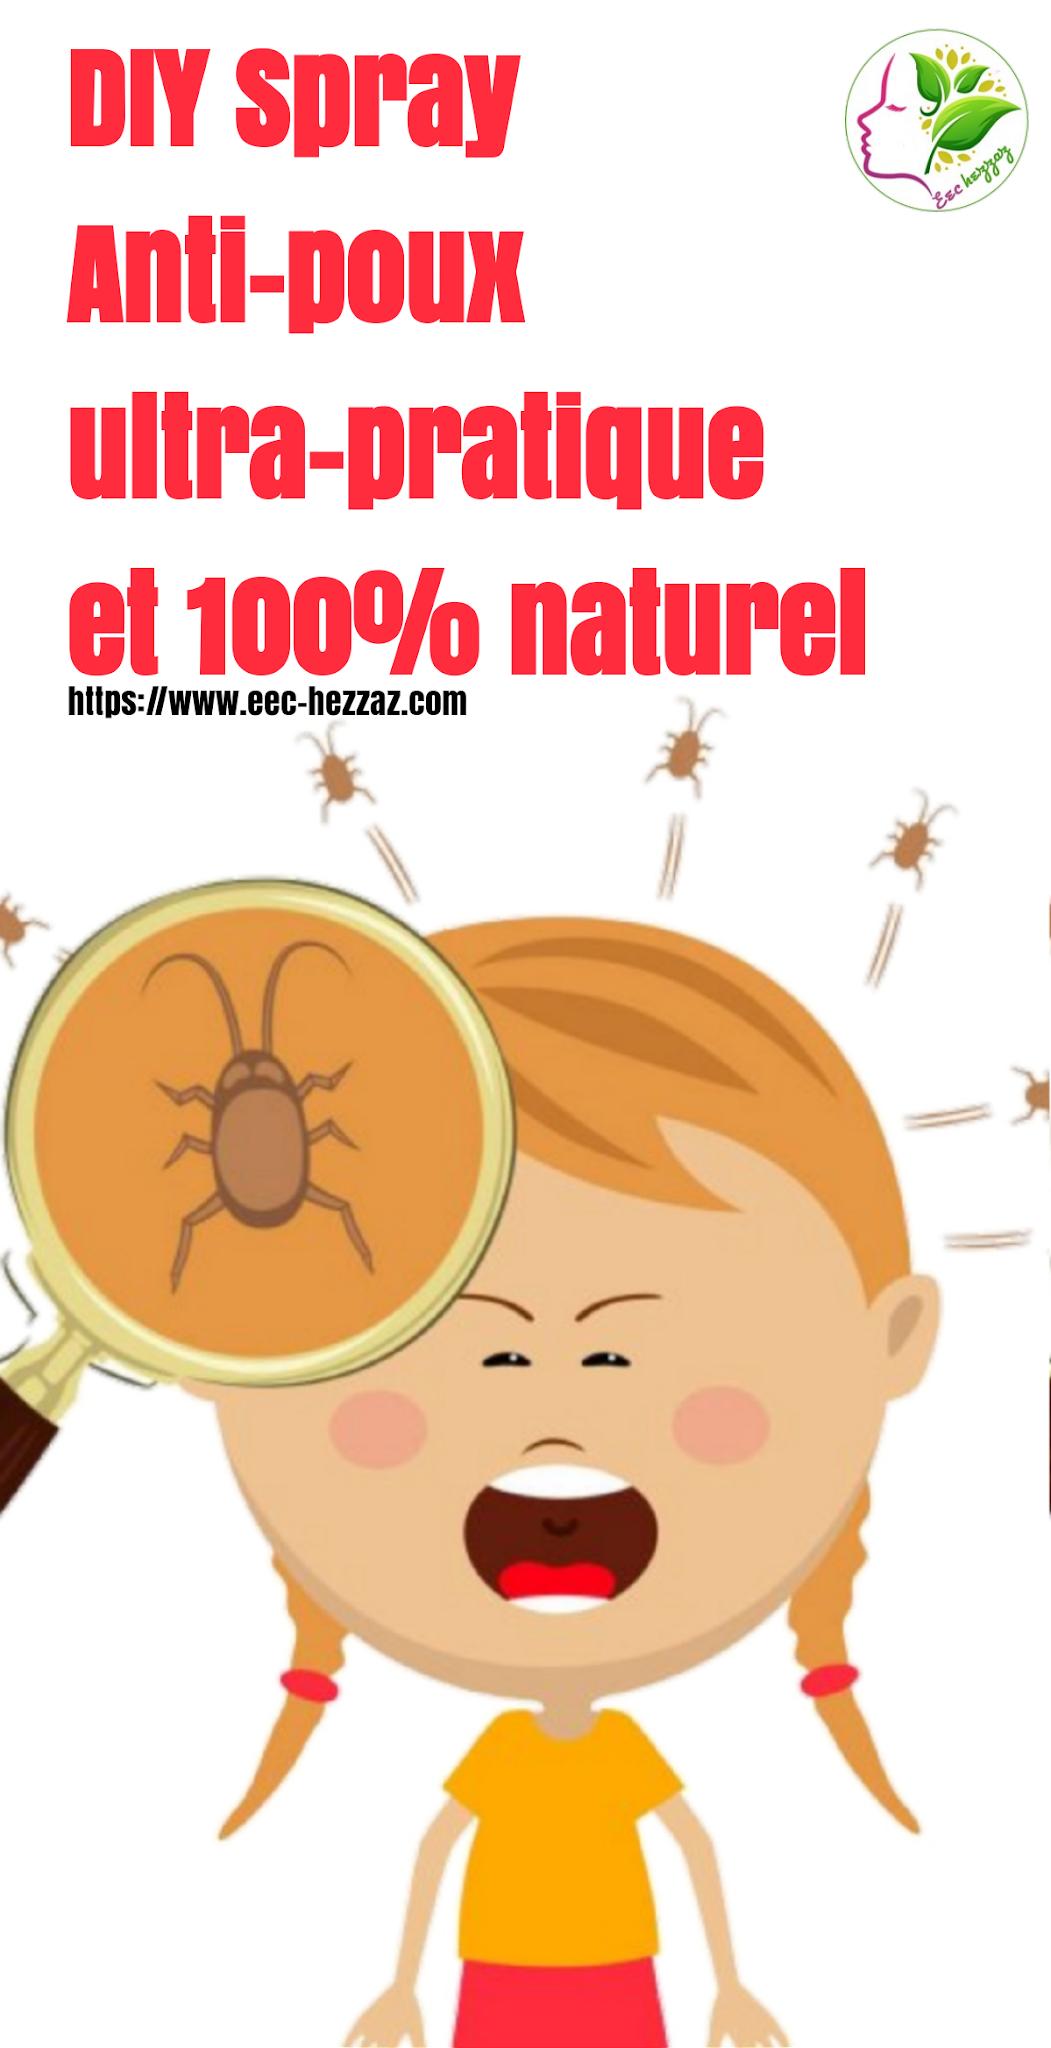 DIY Spray Anti-poux ultra-pratique et 100% naturel